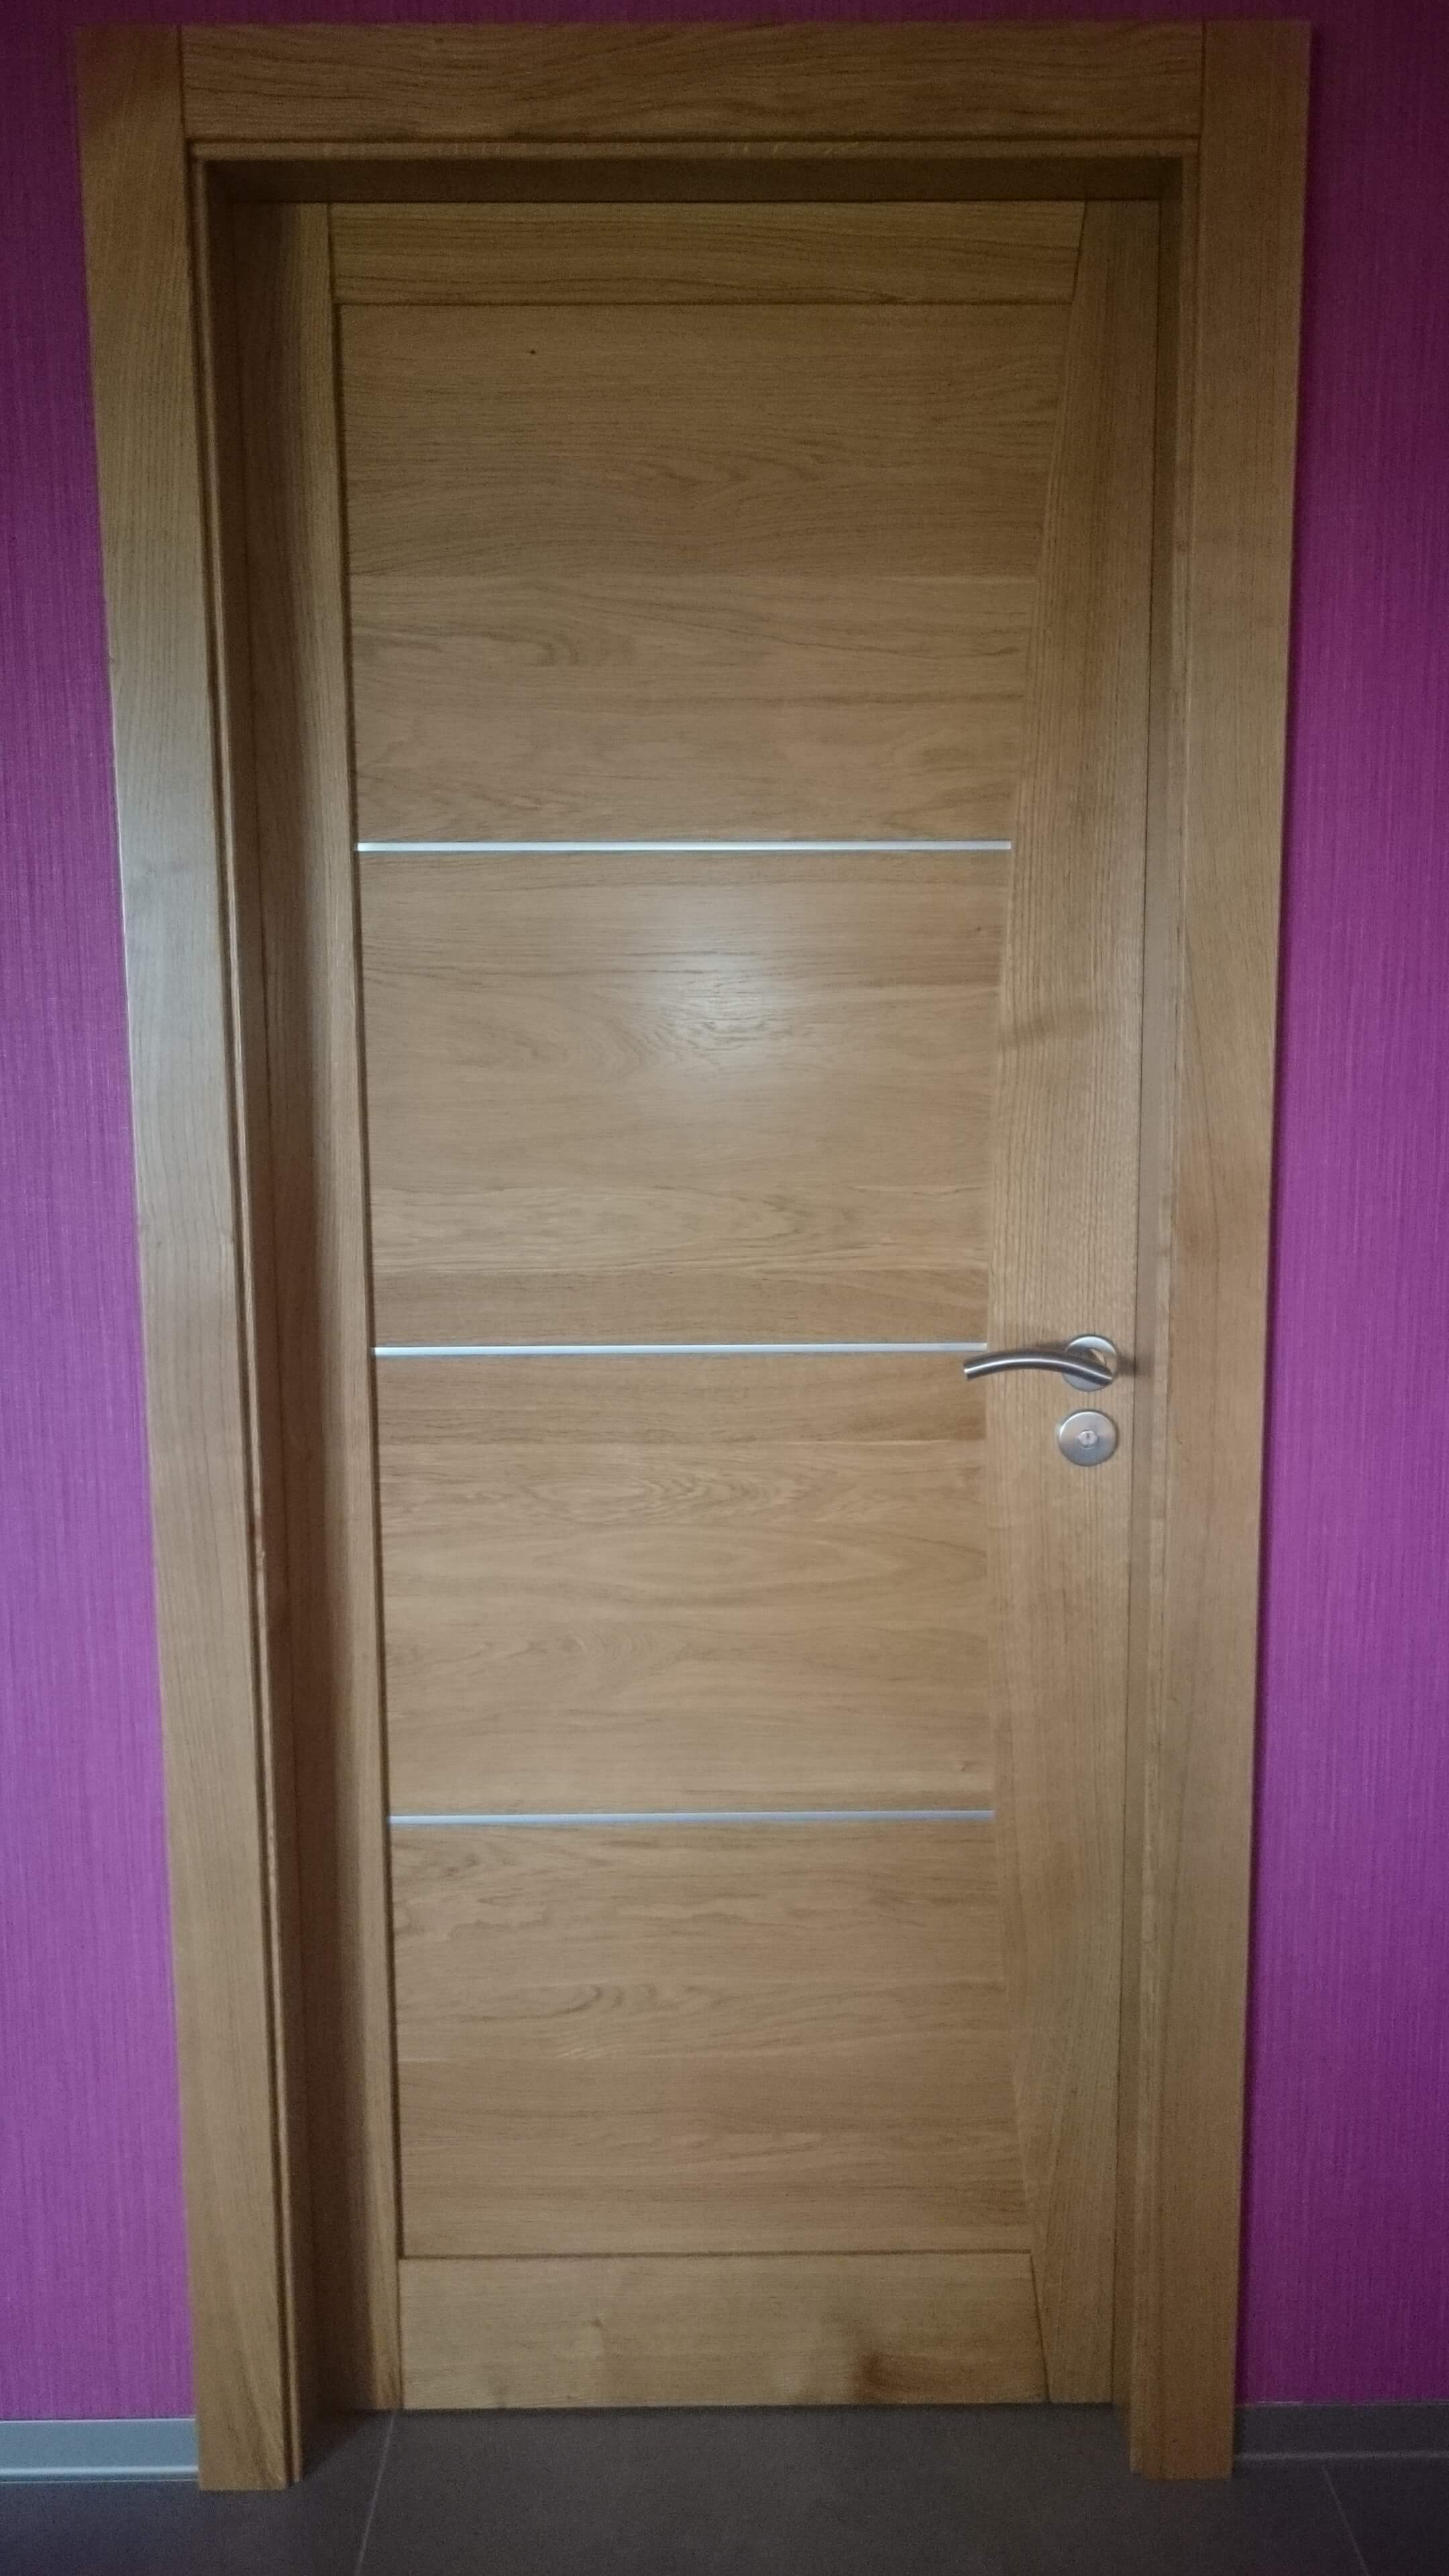 Menuiserie Figard - Fabrication sur mesure - Porte d'intérieur - Chêne insert alu - Vesoul